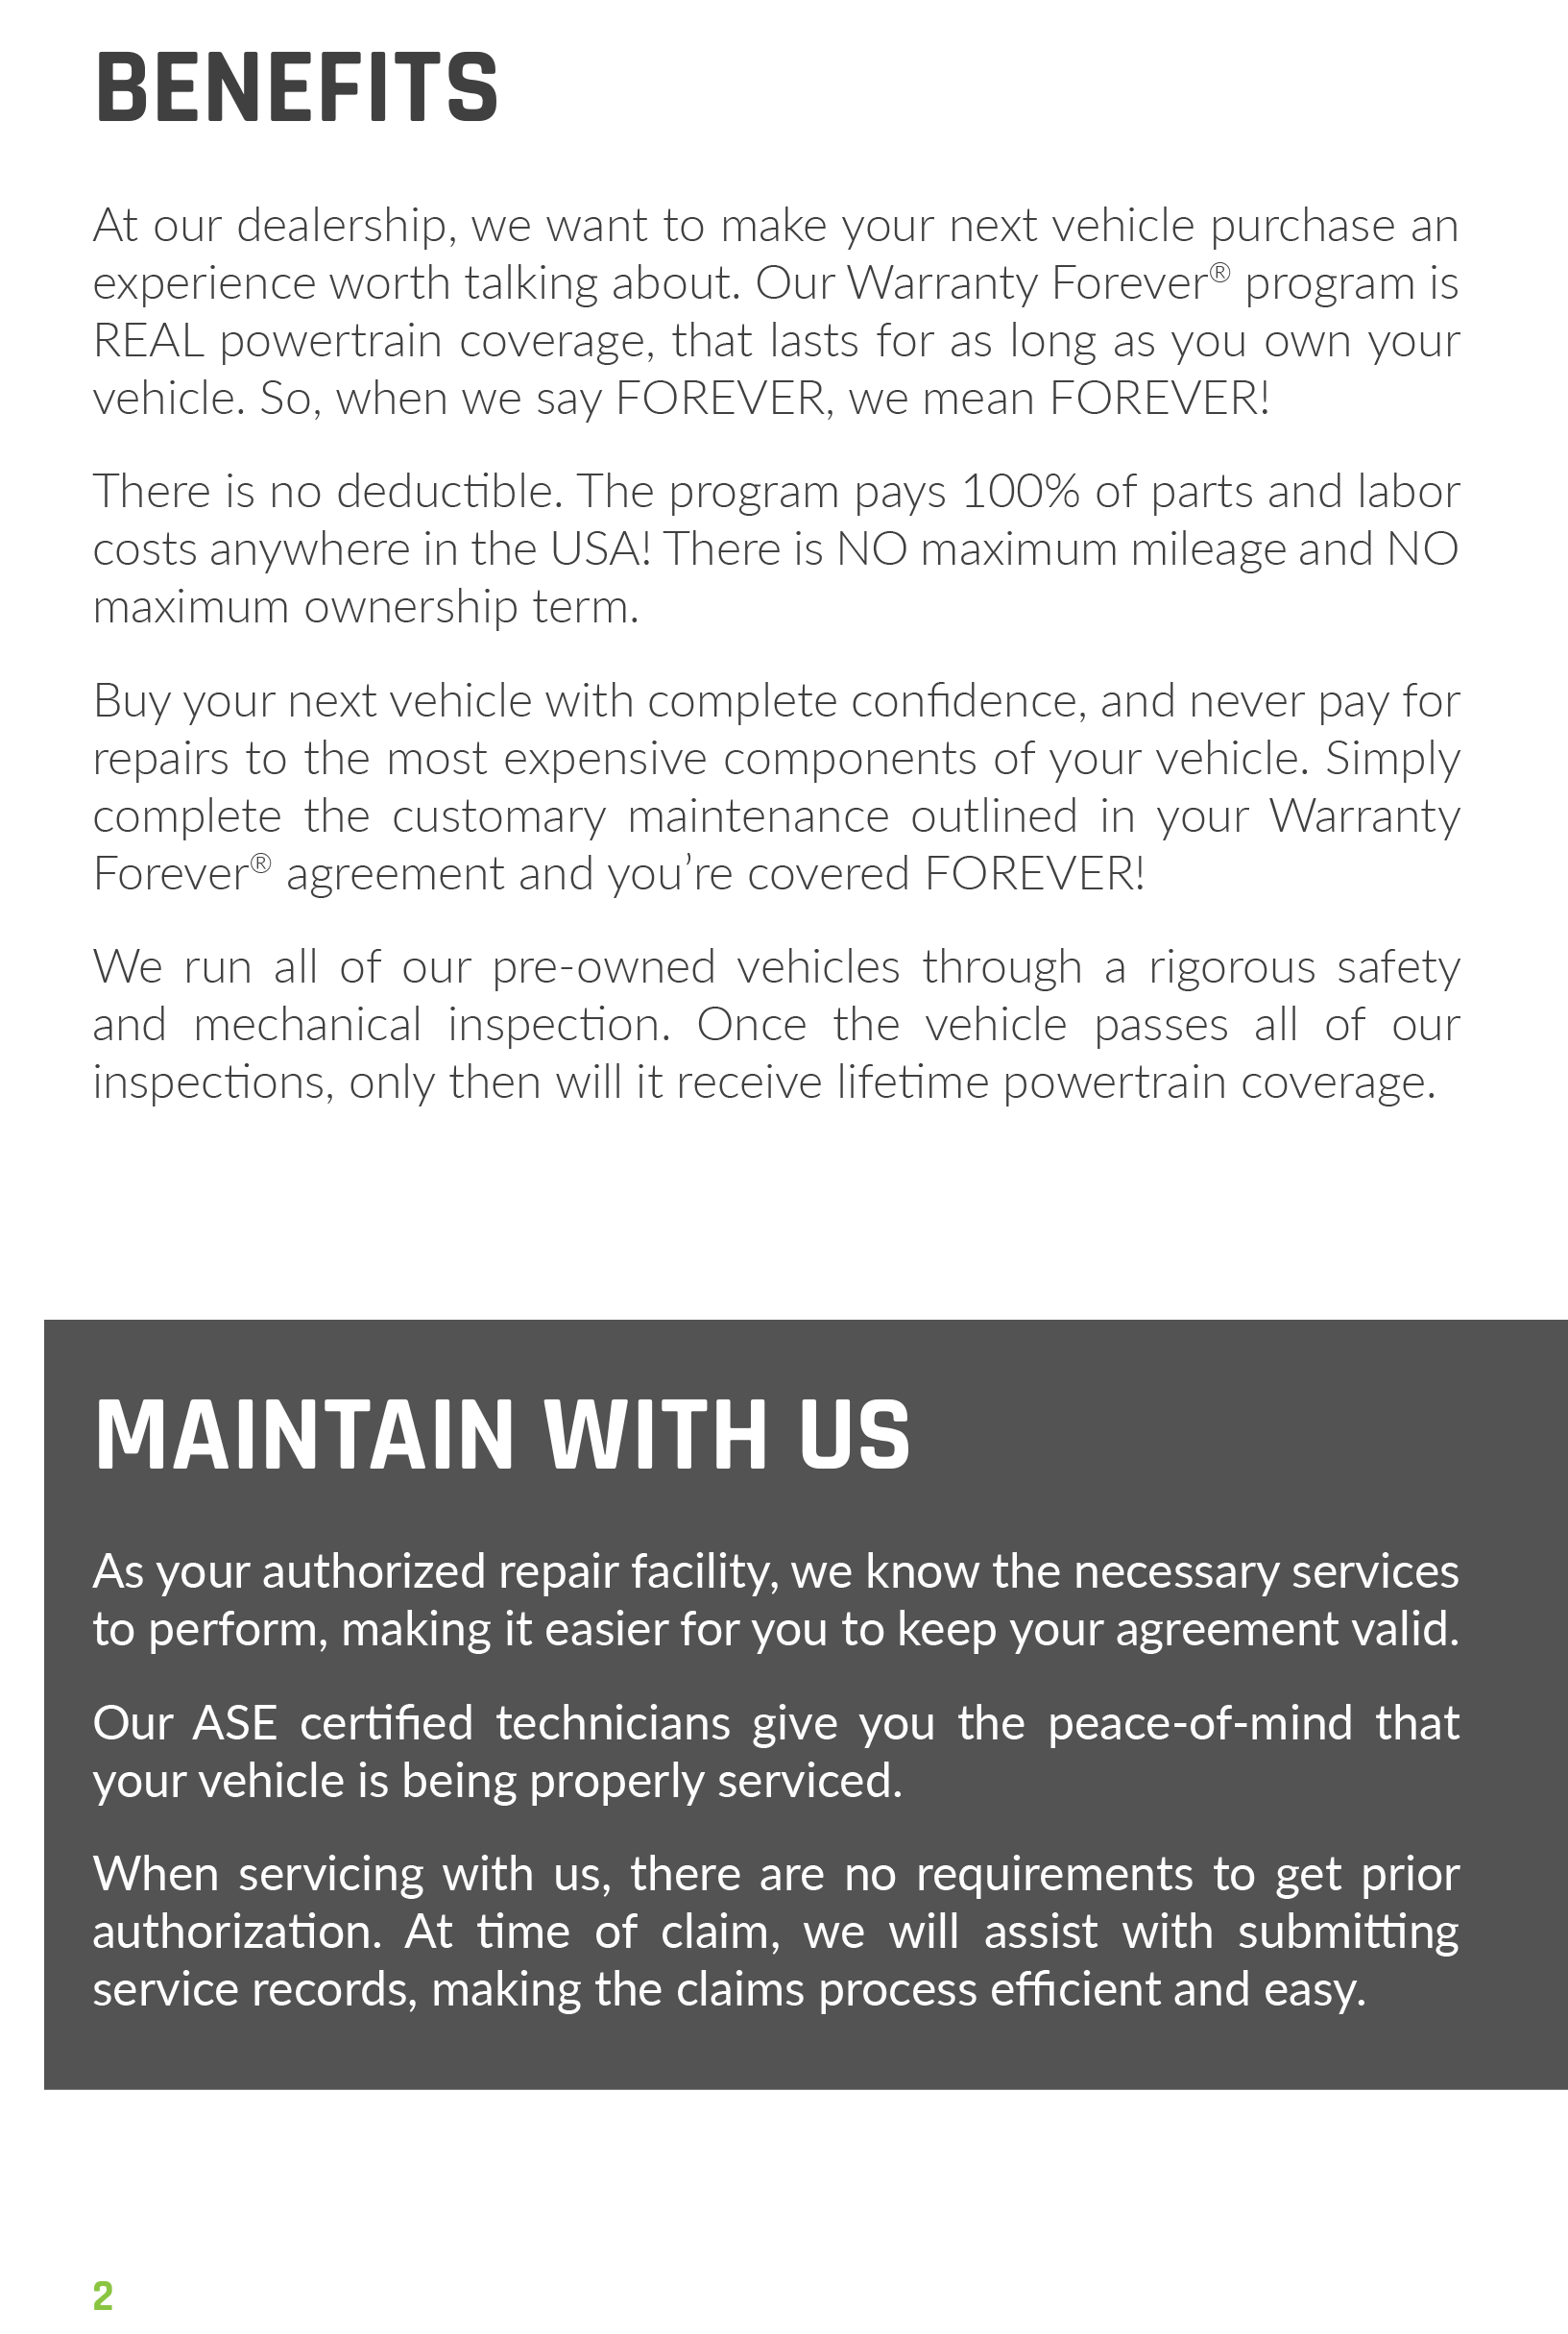 warranty forever texas city dealers houston dealership conroe dealer texas dealers demontrond auto group warranty forever texas city dealers